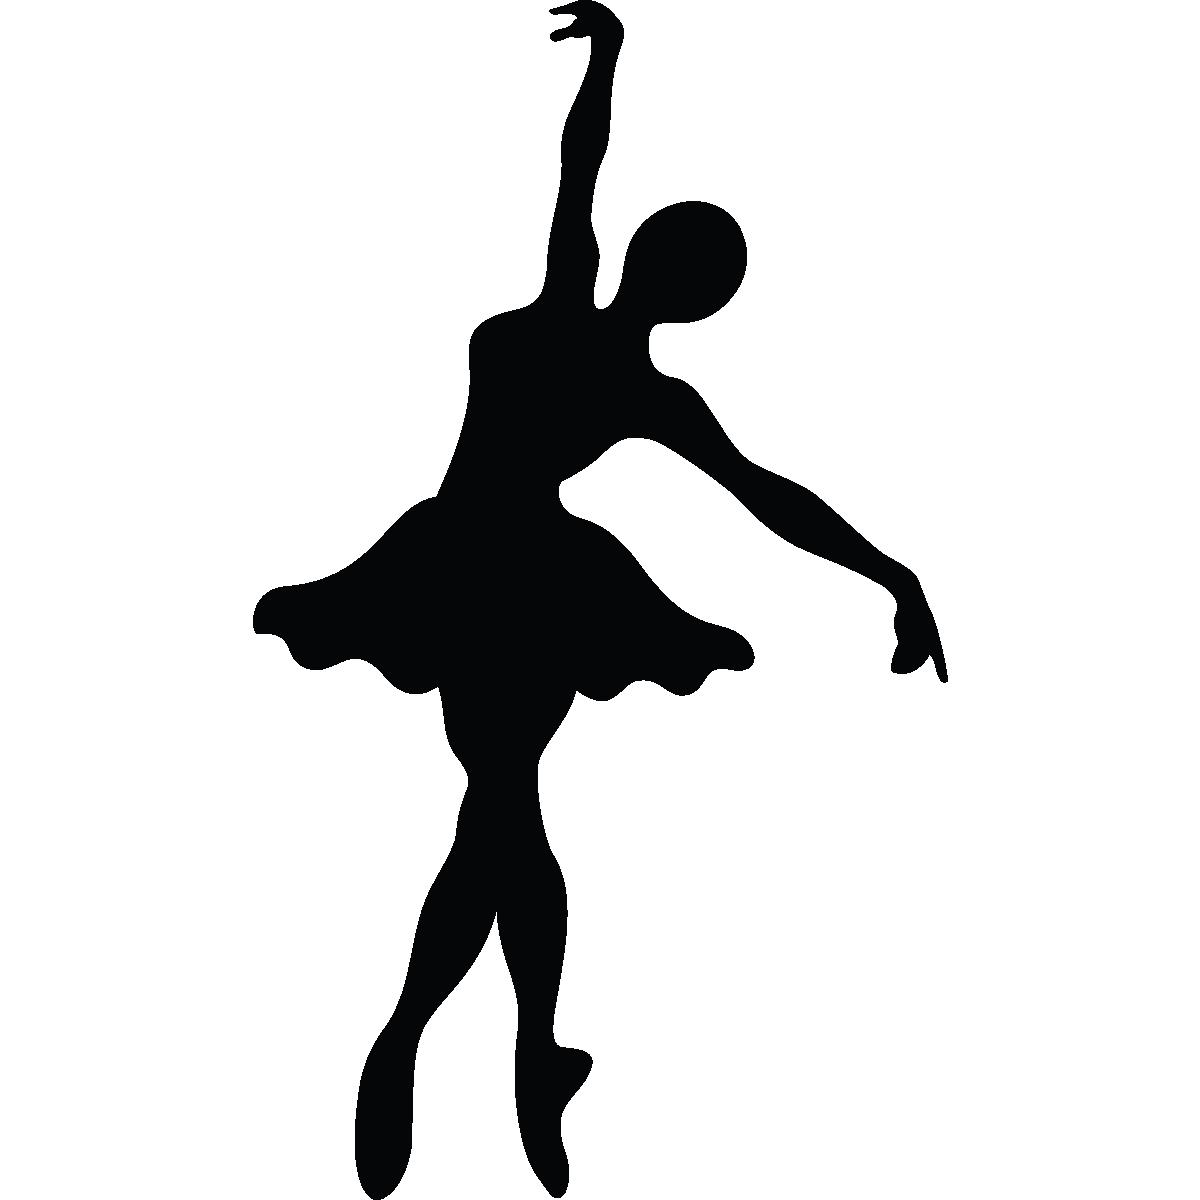 stickers muraux de silhouettes et personnages sticker silhouette danseuse ambiance. Black Bedroom Furniture Sets. Home Design Ideas